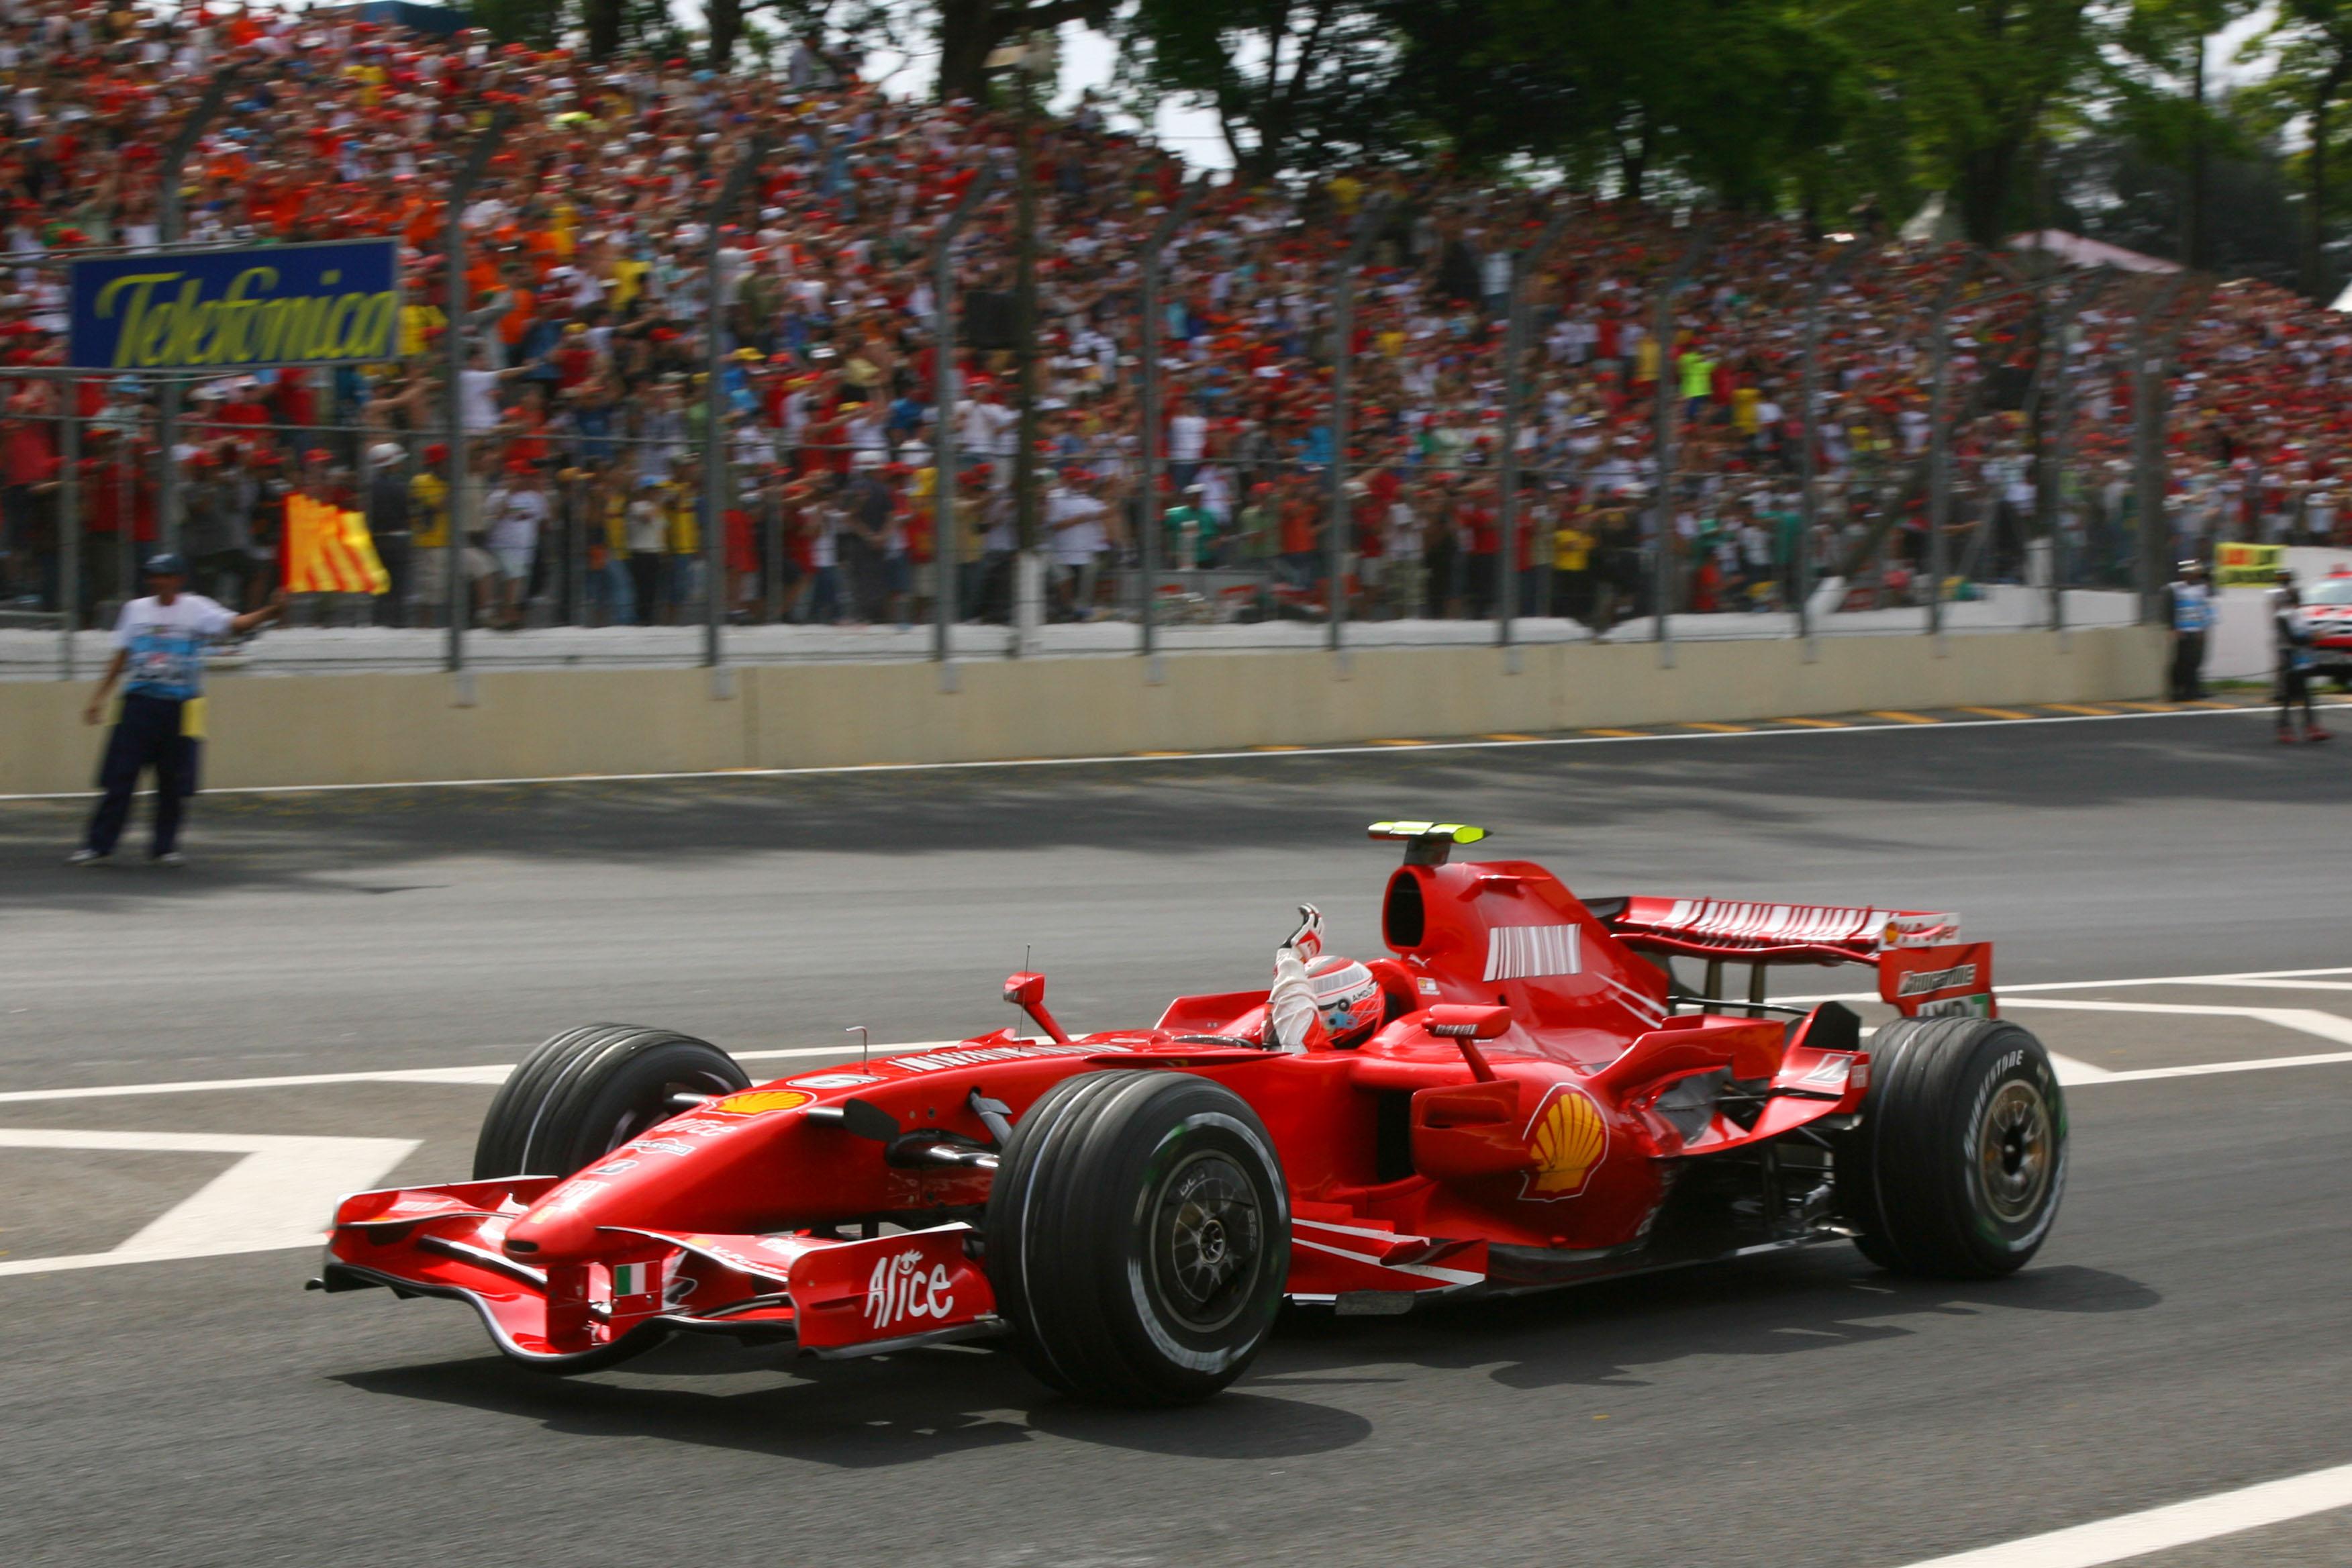 Formula 1 Grand Prix, Brazil, Sunday Podium